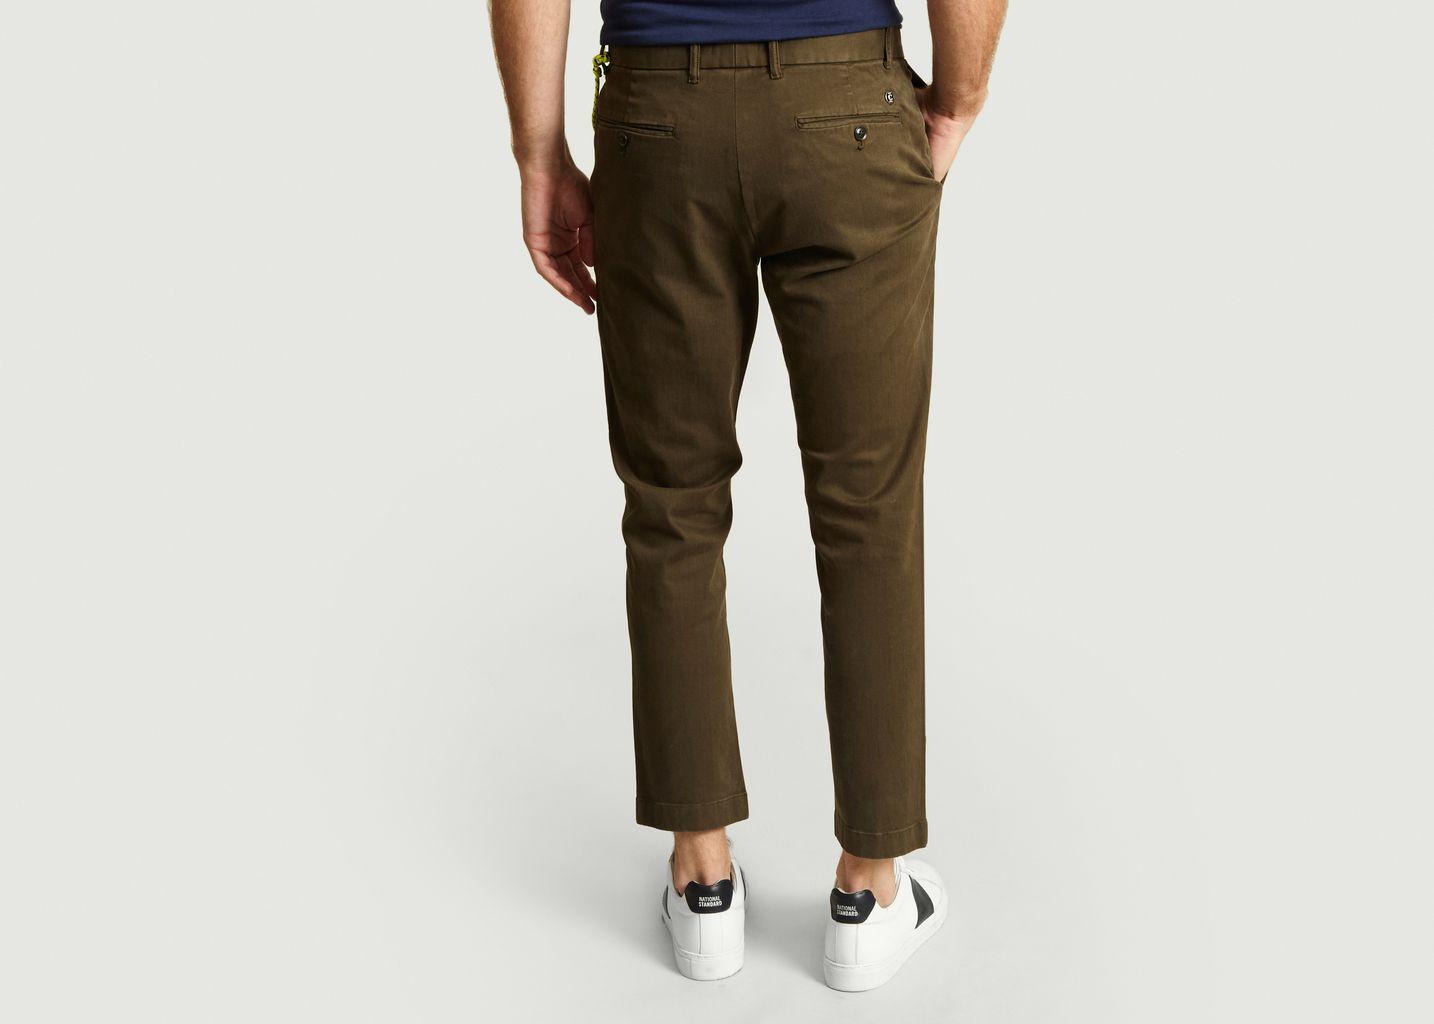 Pantalon Chino Atelier Cropped - Closed